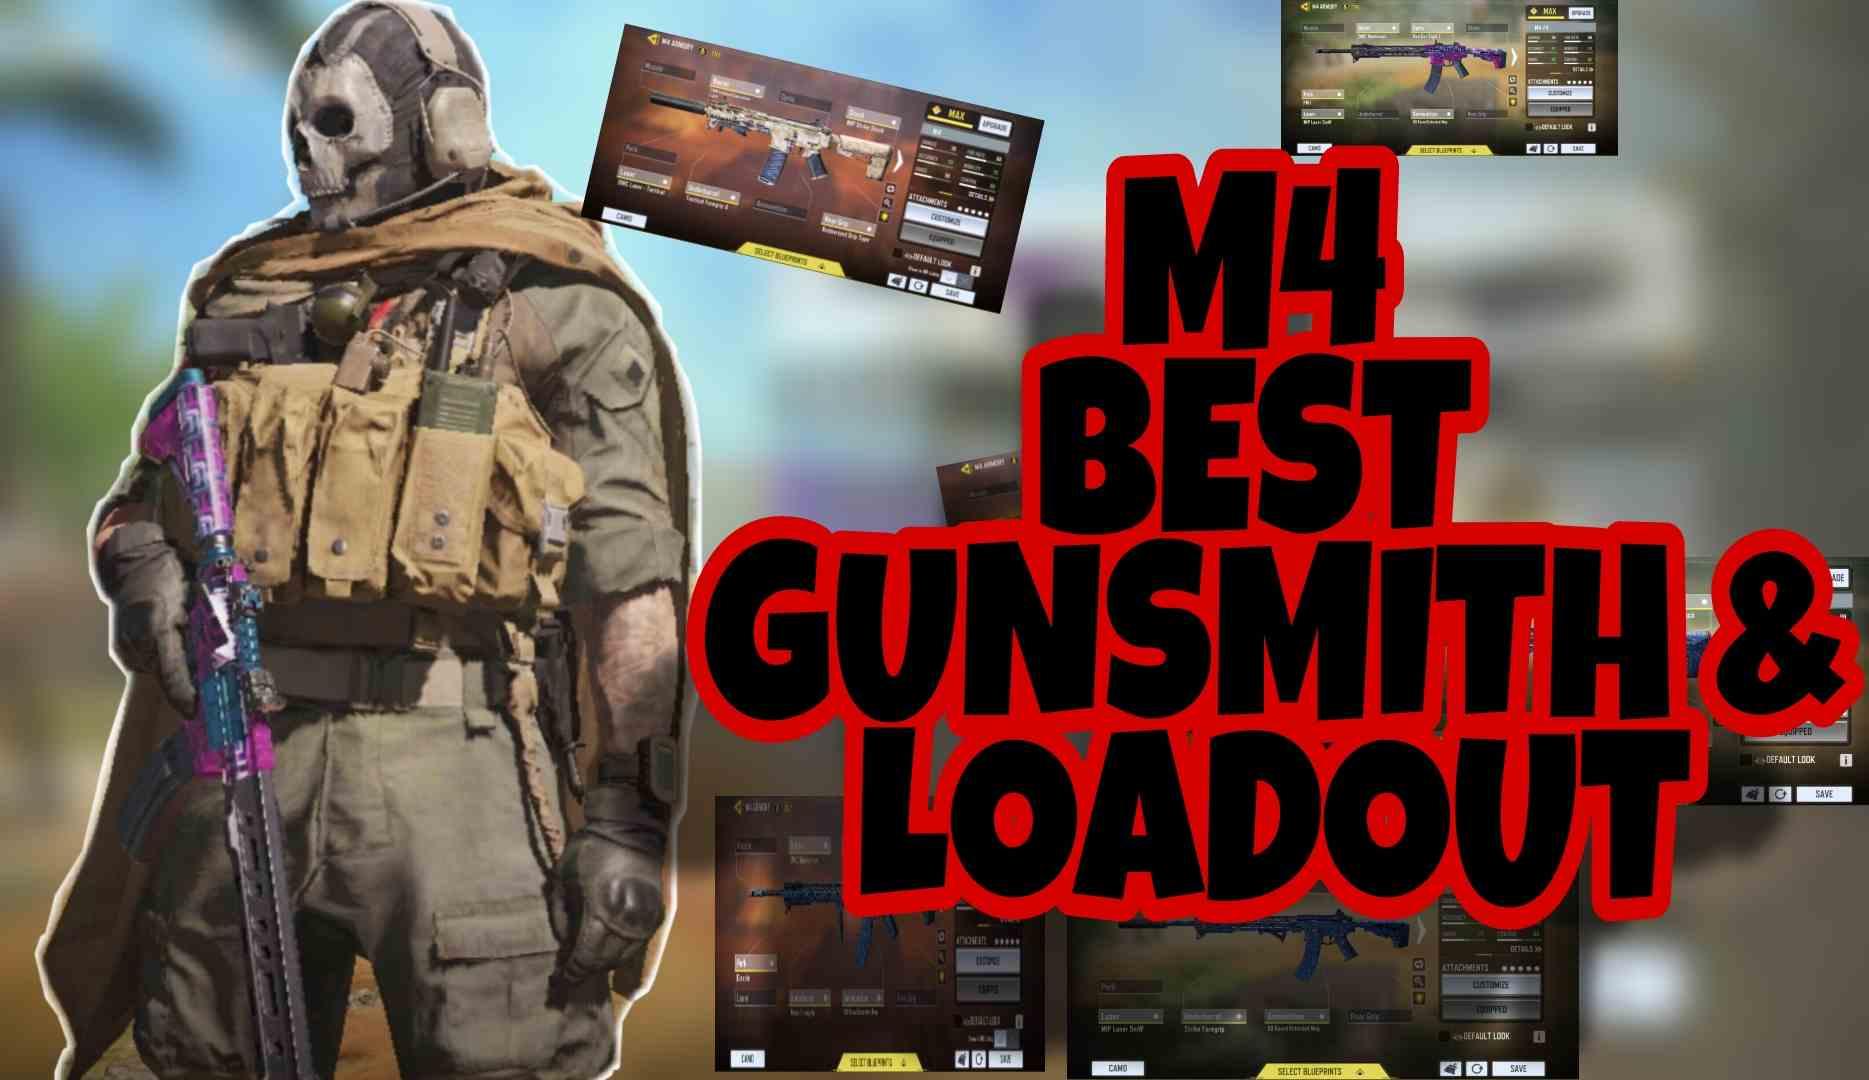 M4 gunsmith thumbnail